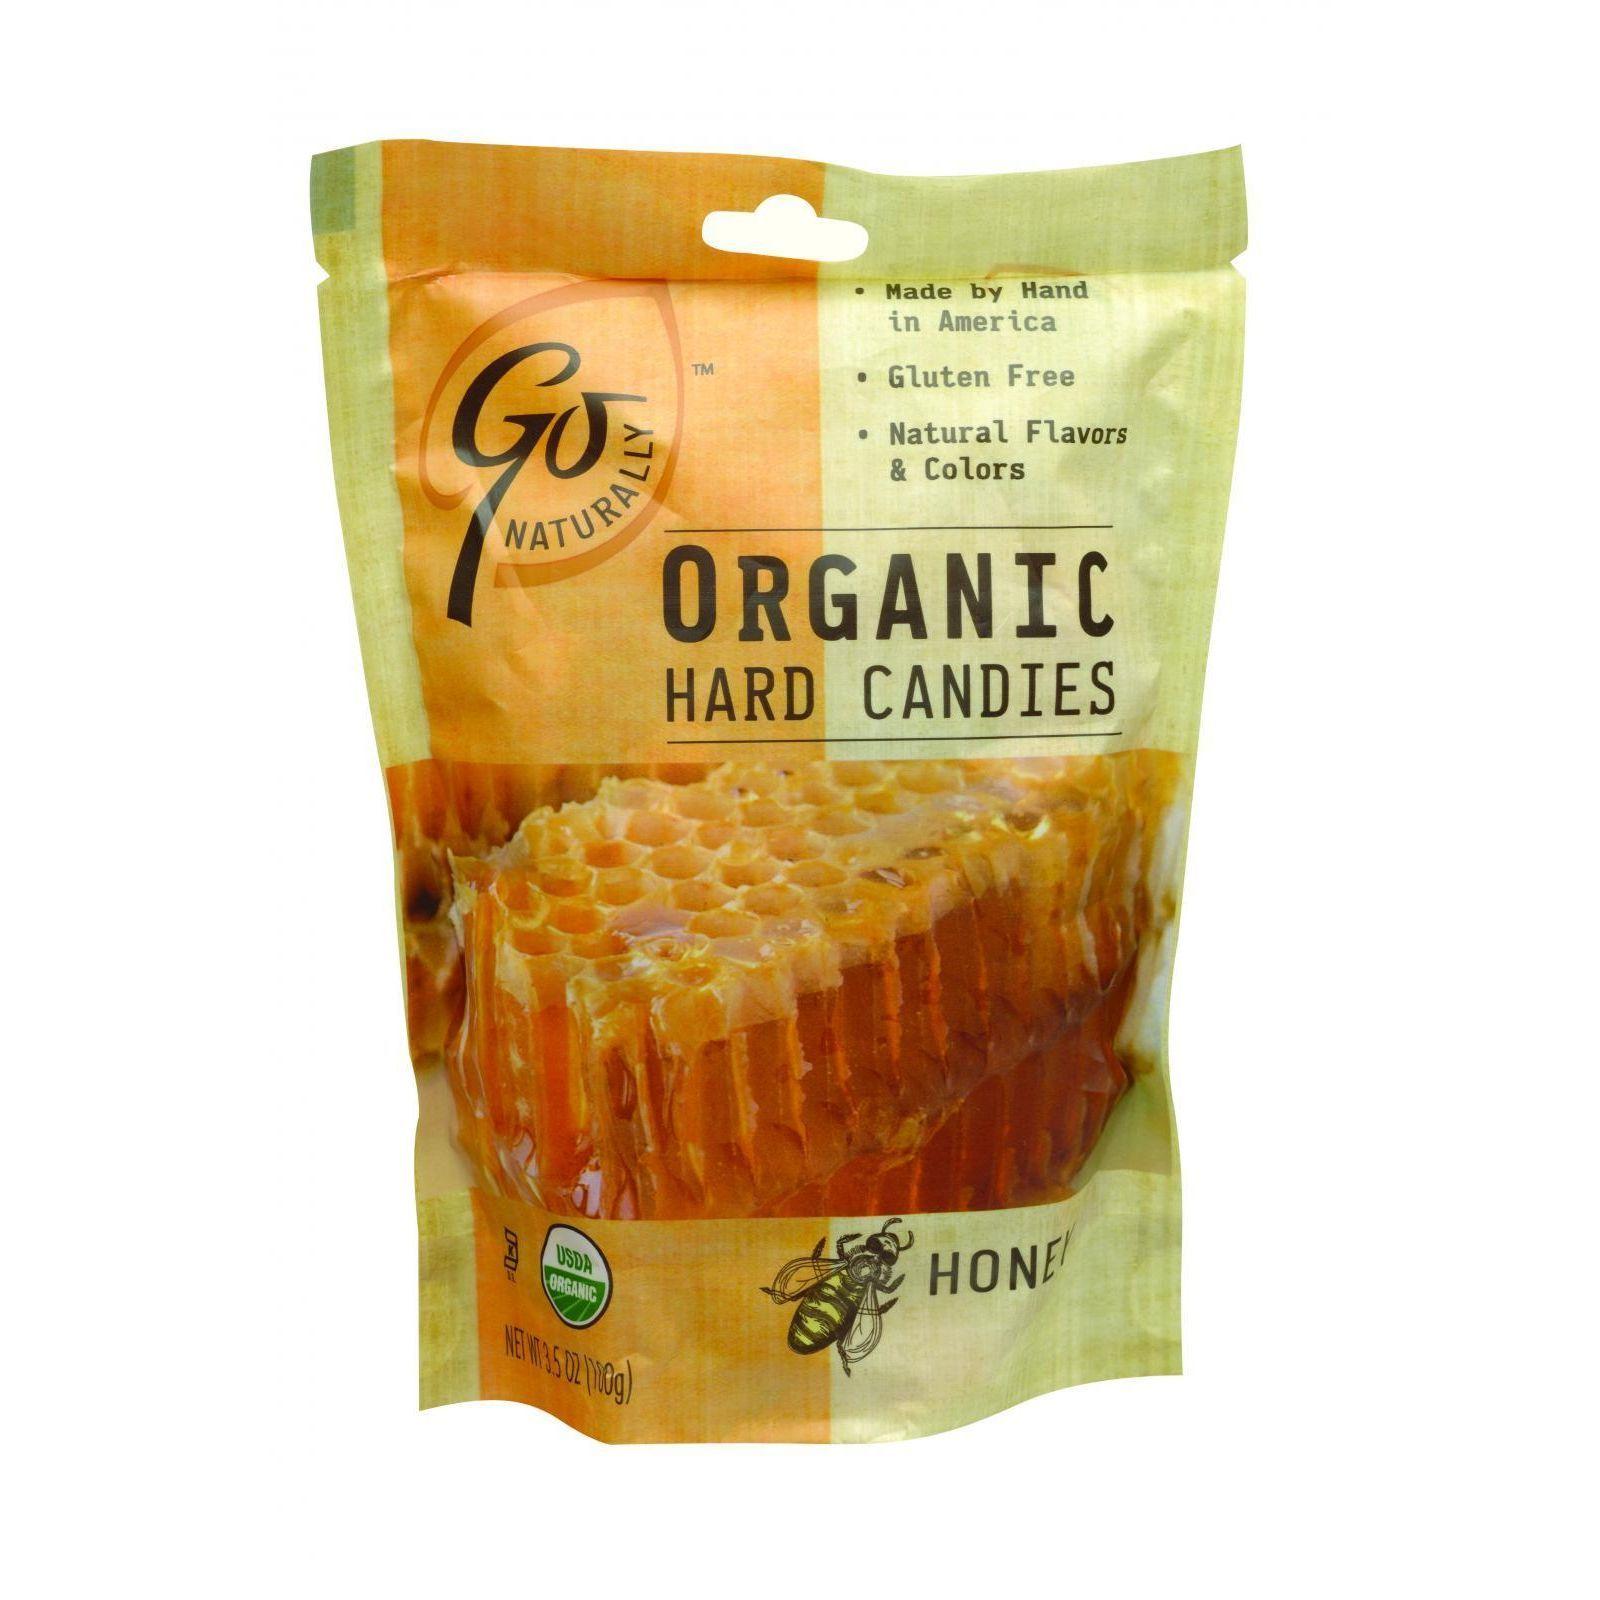 Go Organic Hard Candy - Honey - 3.5 oz - Case of 6